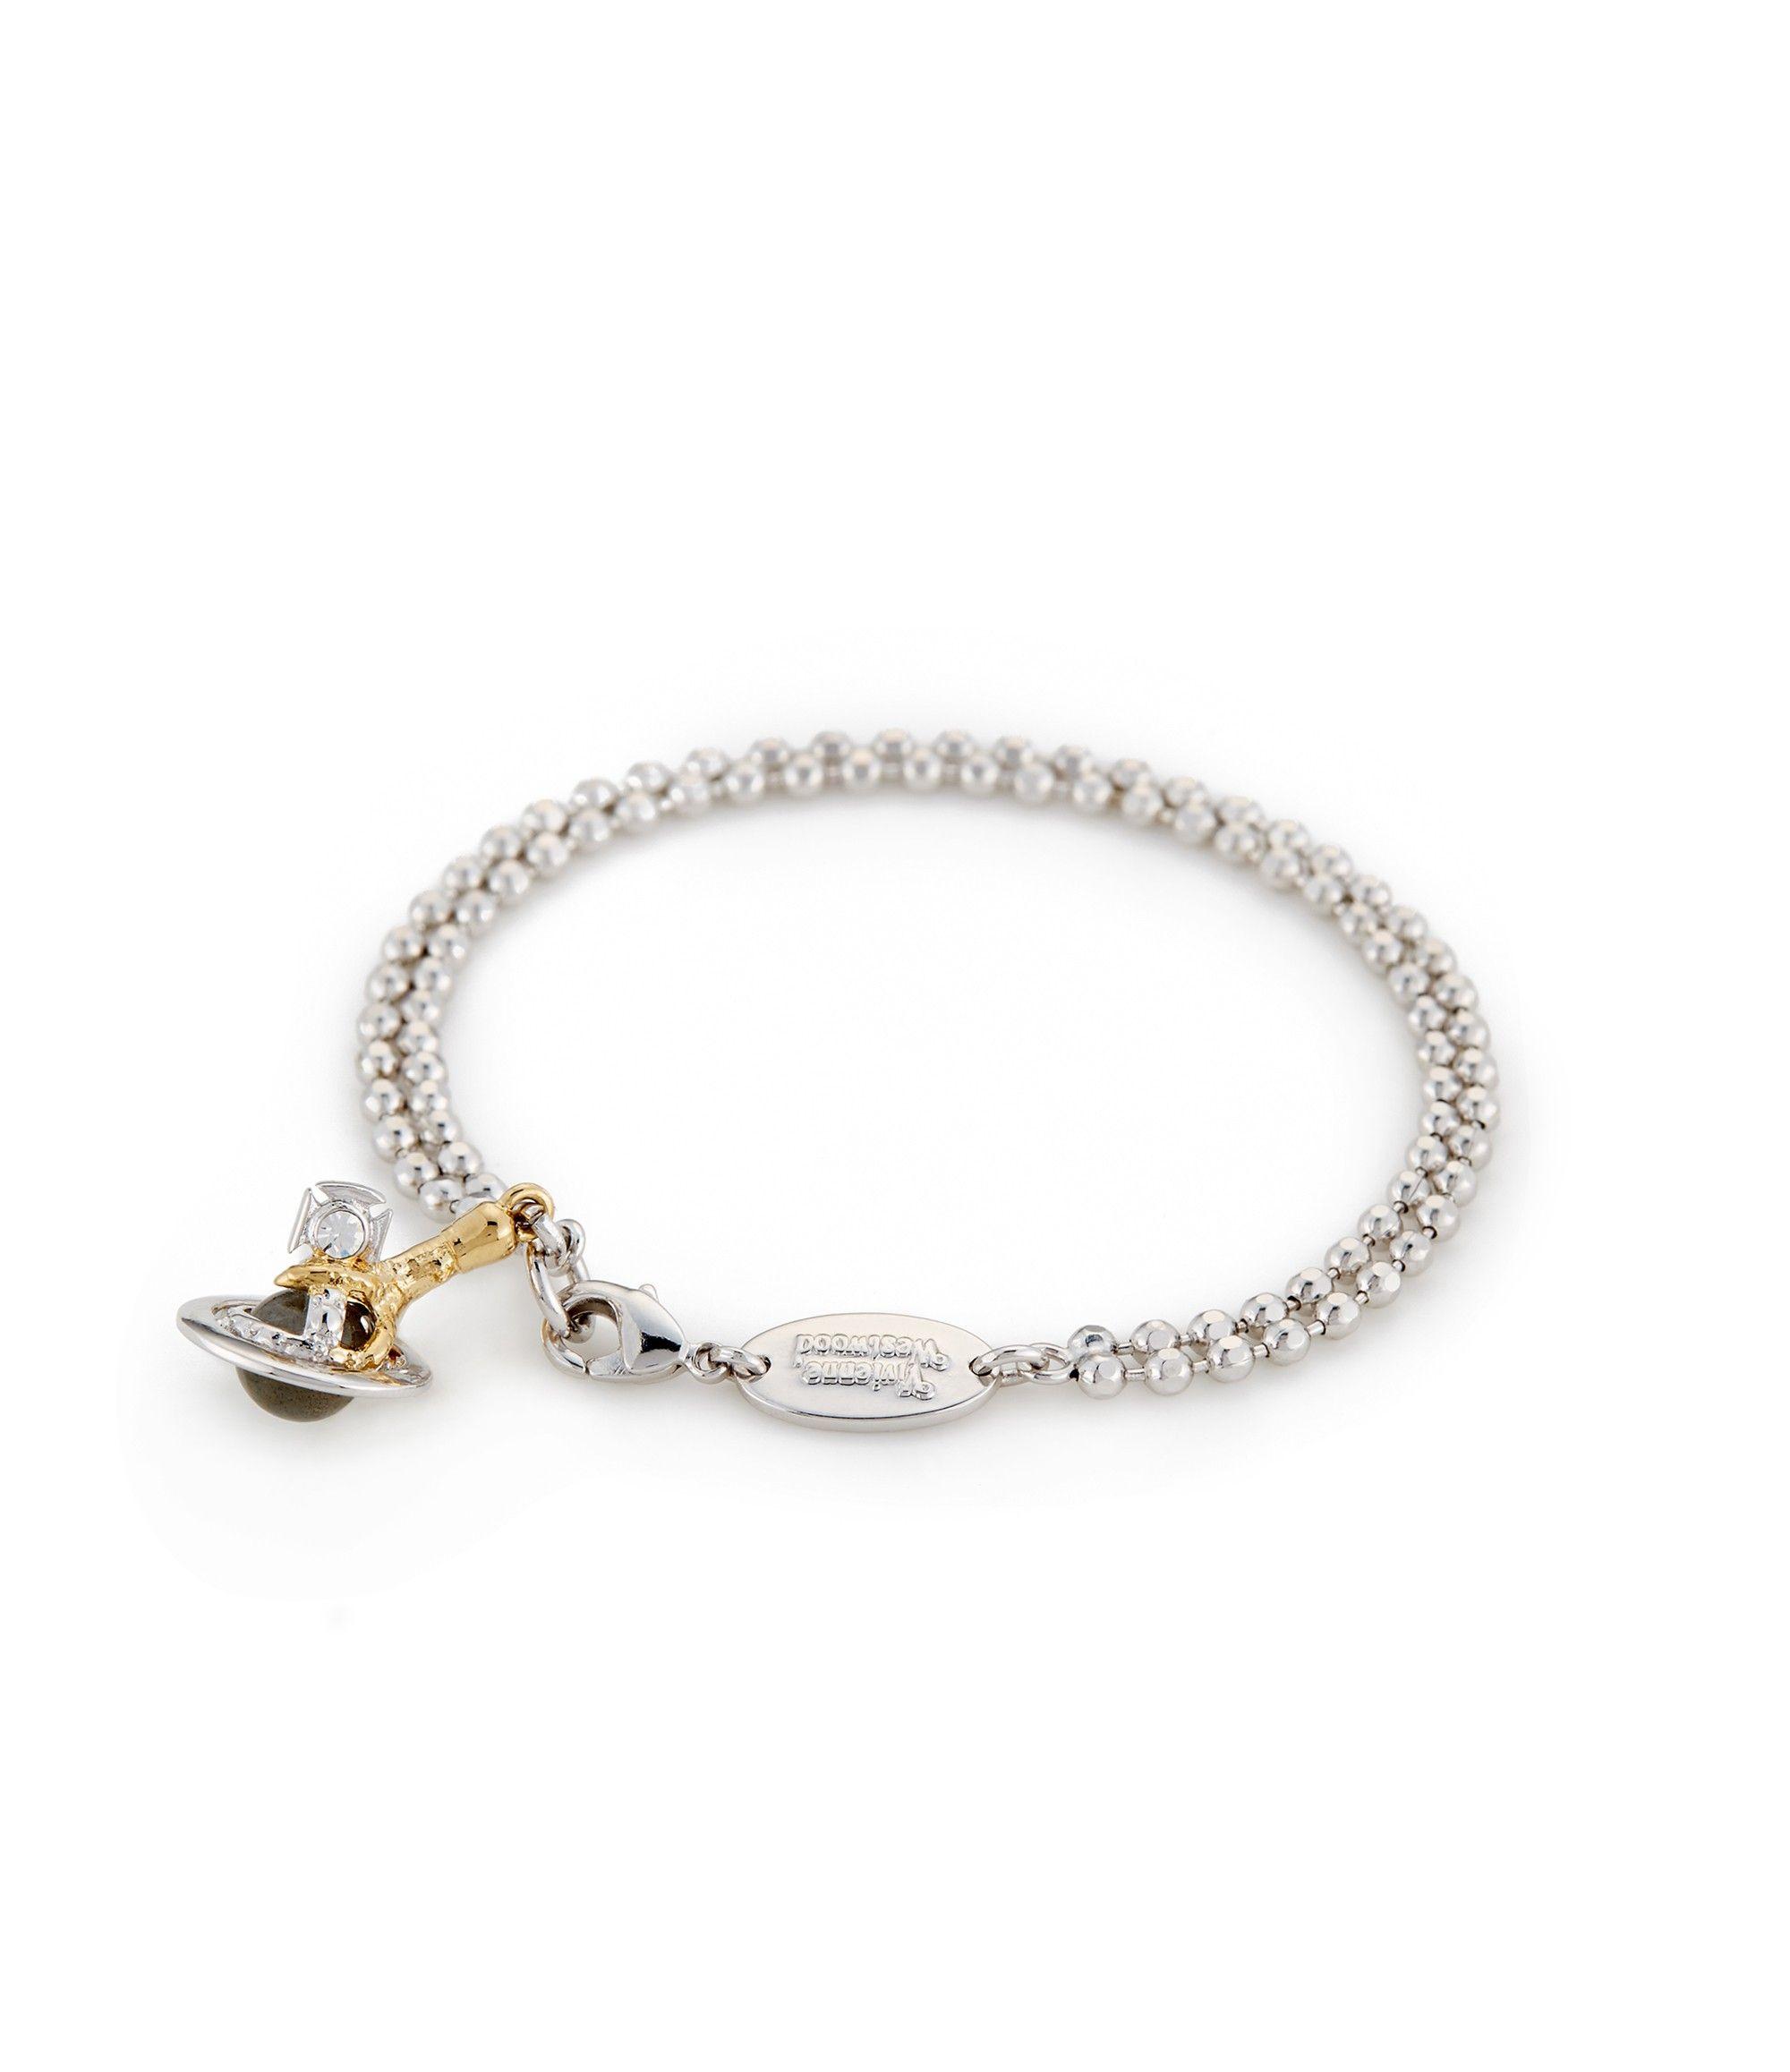 b26a62568e666 New HP   Accessories   Bracelets, Jewelry, Women jewelry